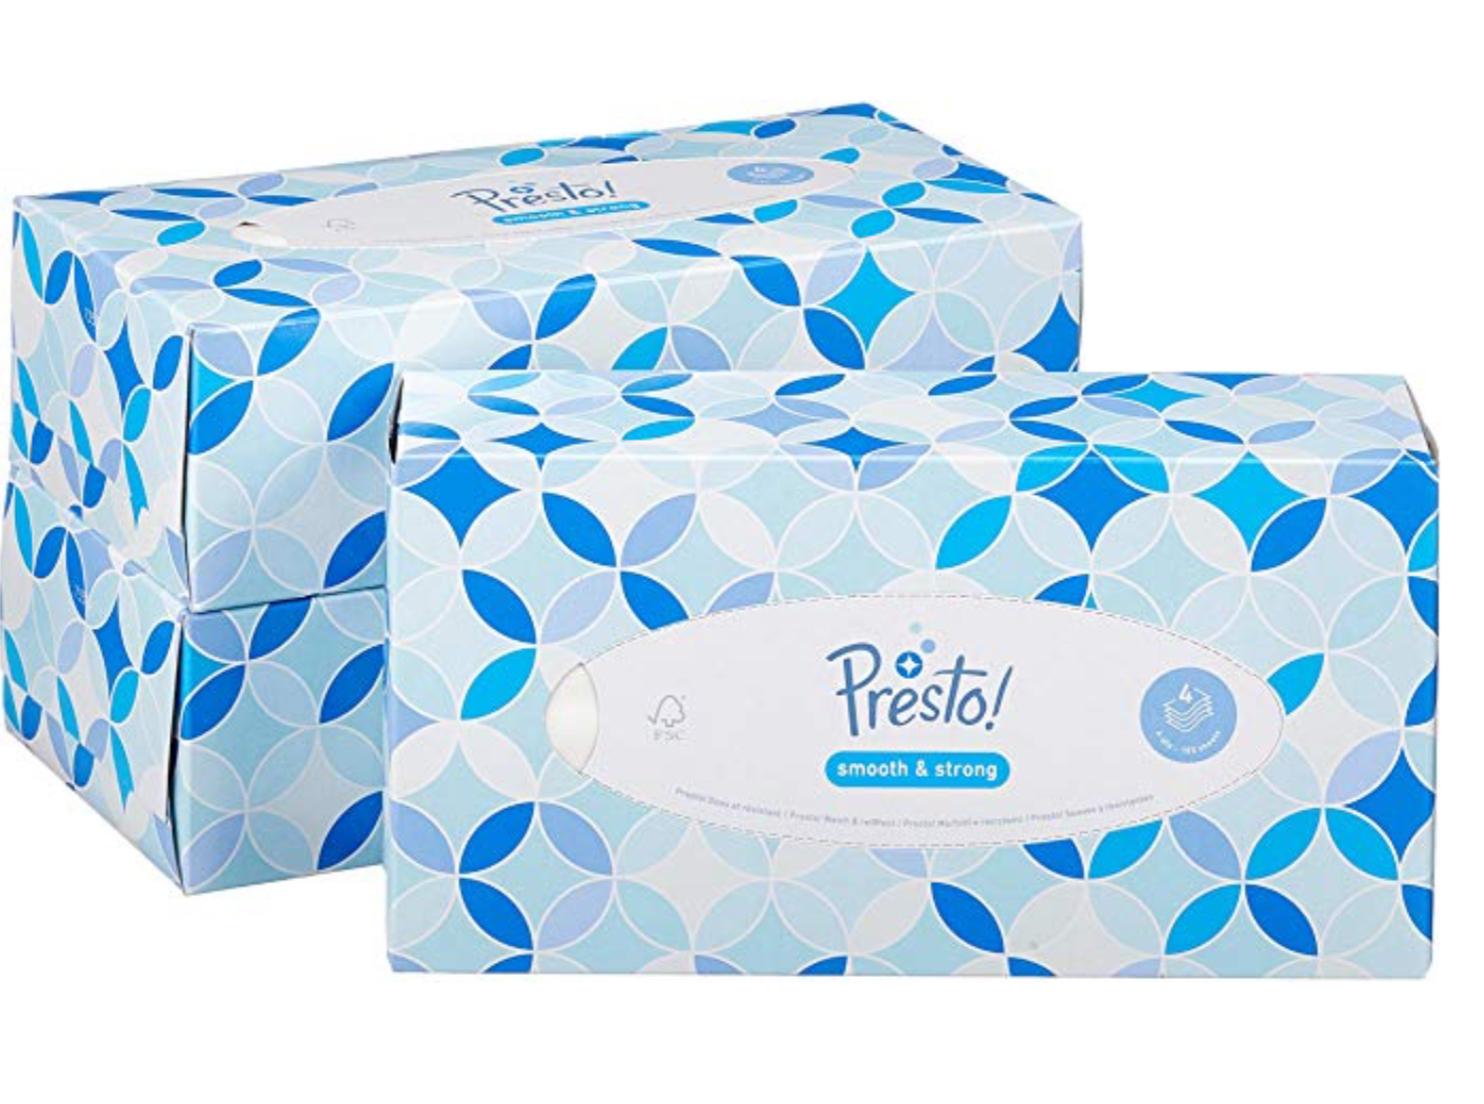 Amazon Brand - Presto! 4-Ply Facial Tissues, 12 Pack (12 x 100 Tissues) £12.52 Prime / £17.01 Non Prime at Amazon